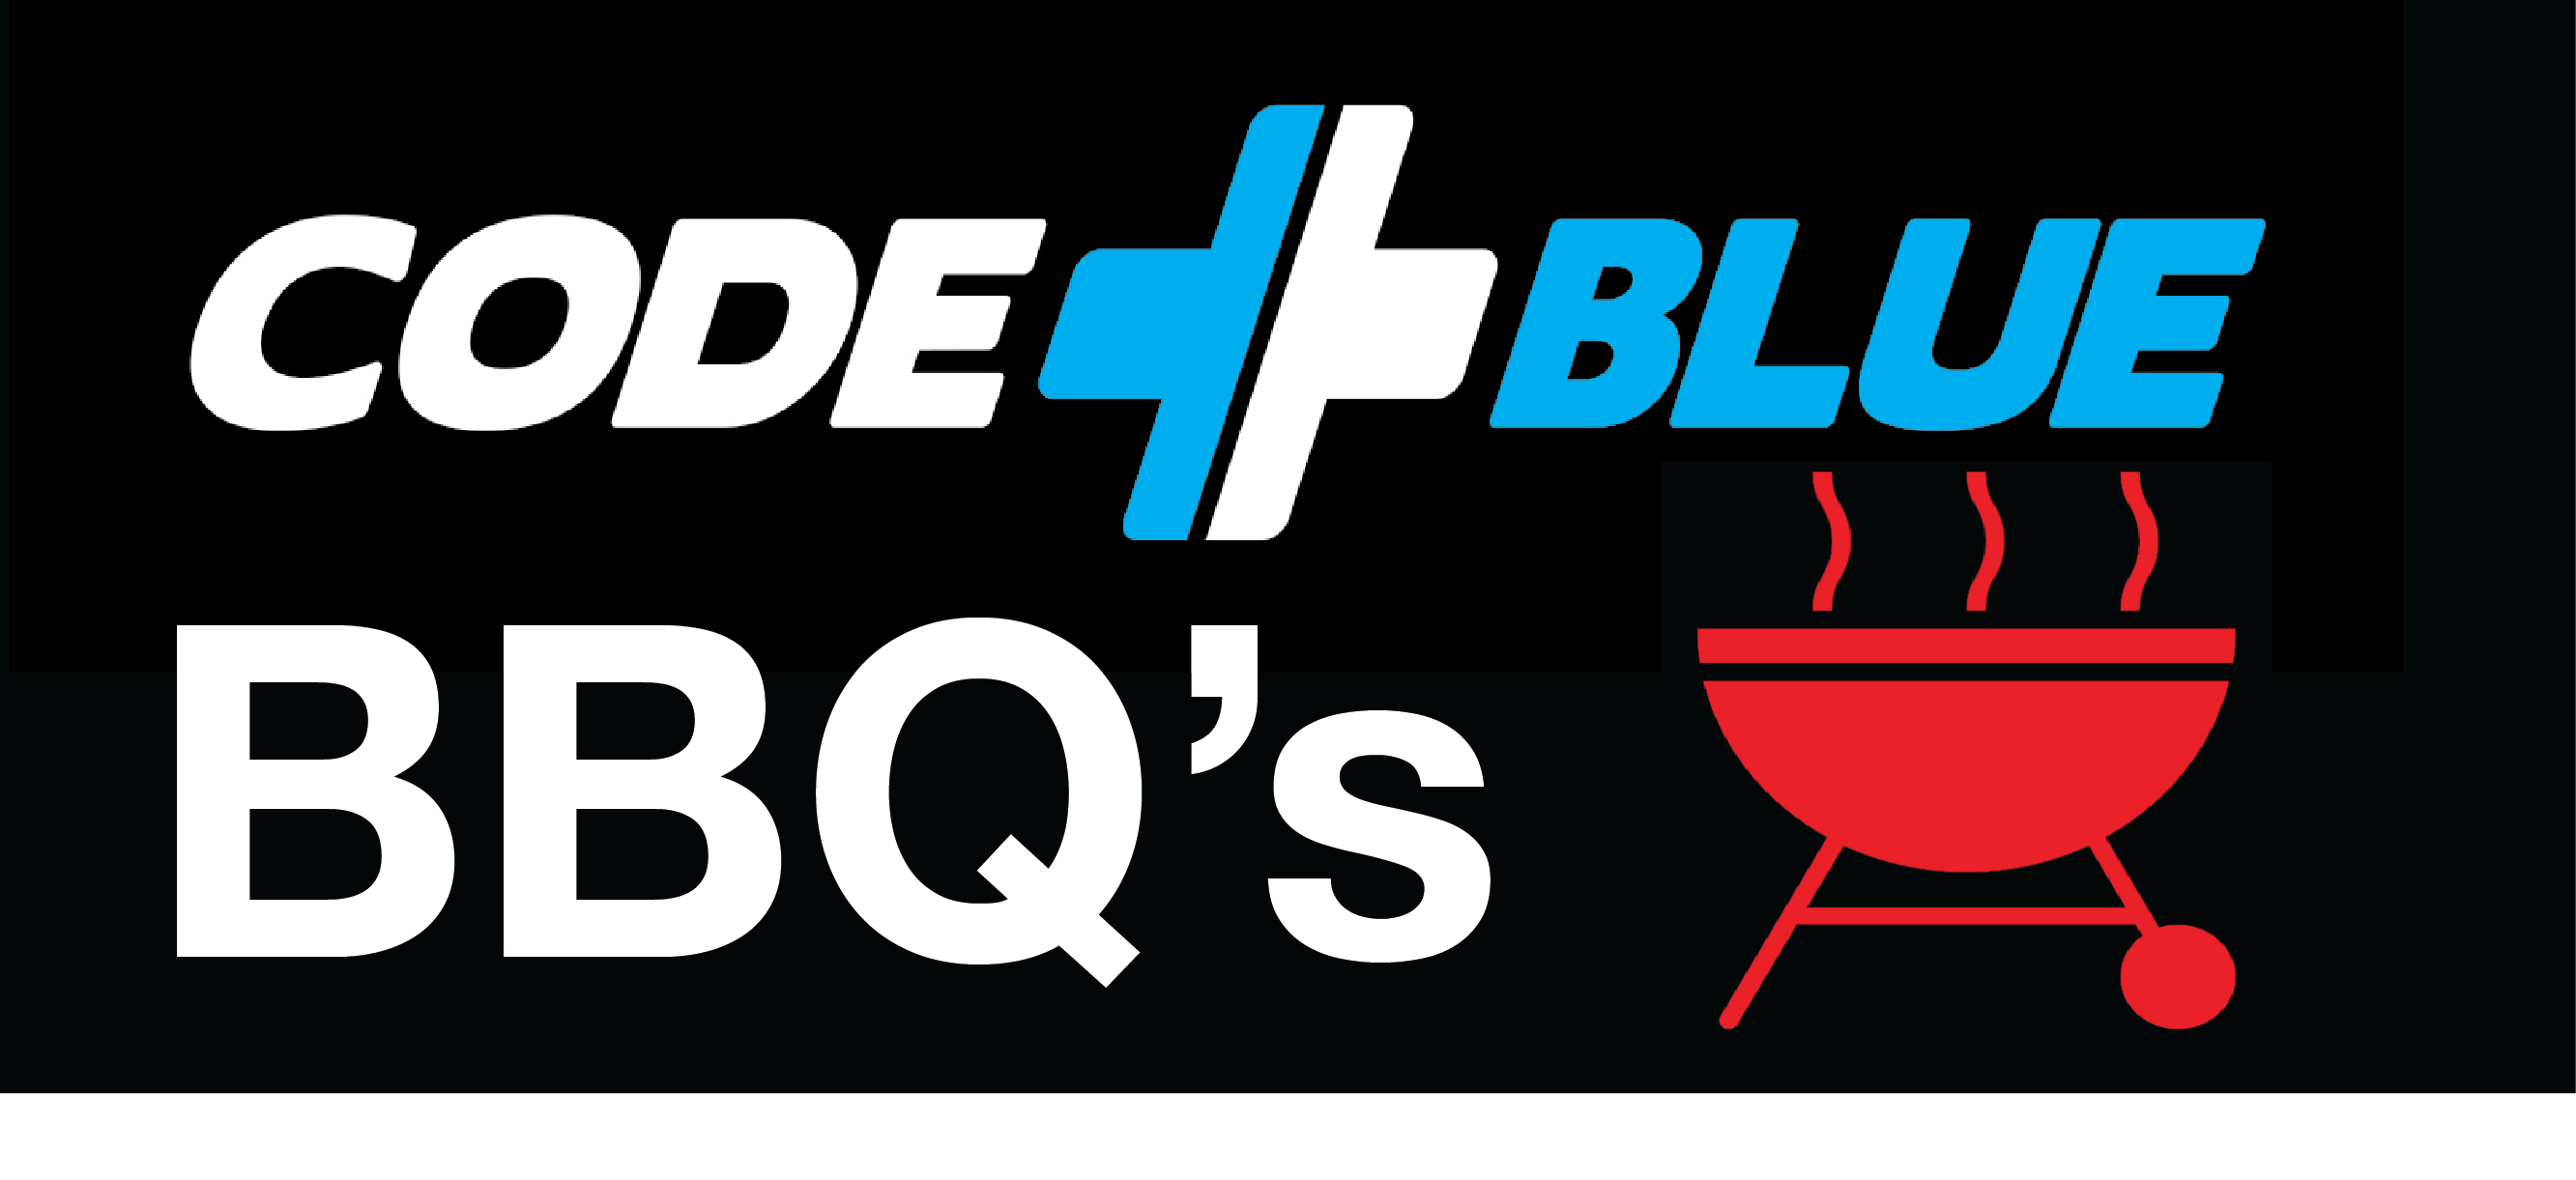 Code Blue BBQ's